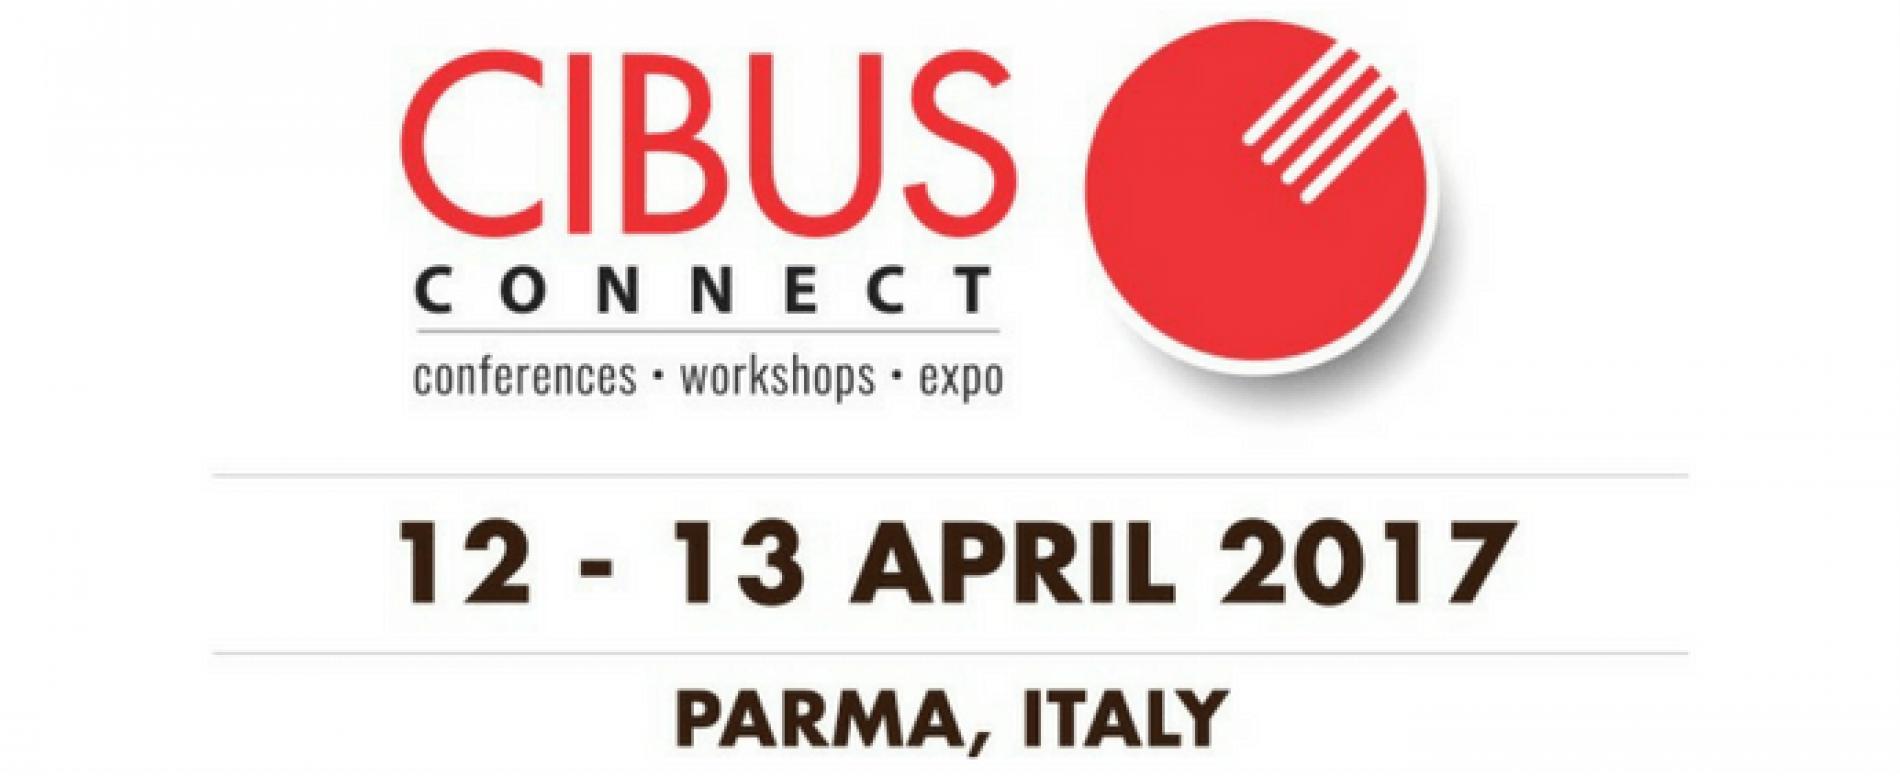 Apre oggi a Parma Cibus Connect, la fiera del Food